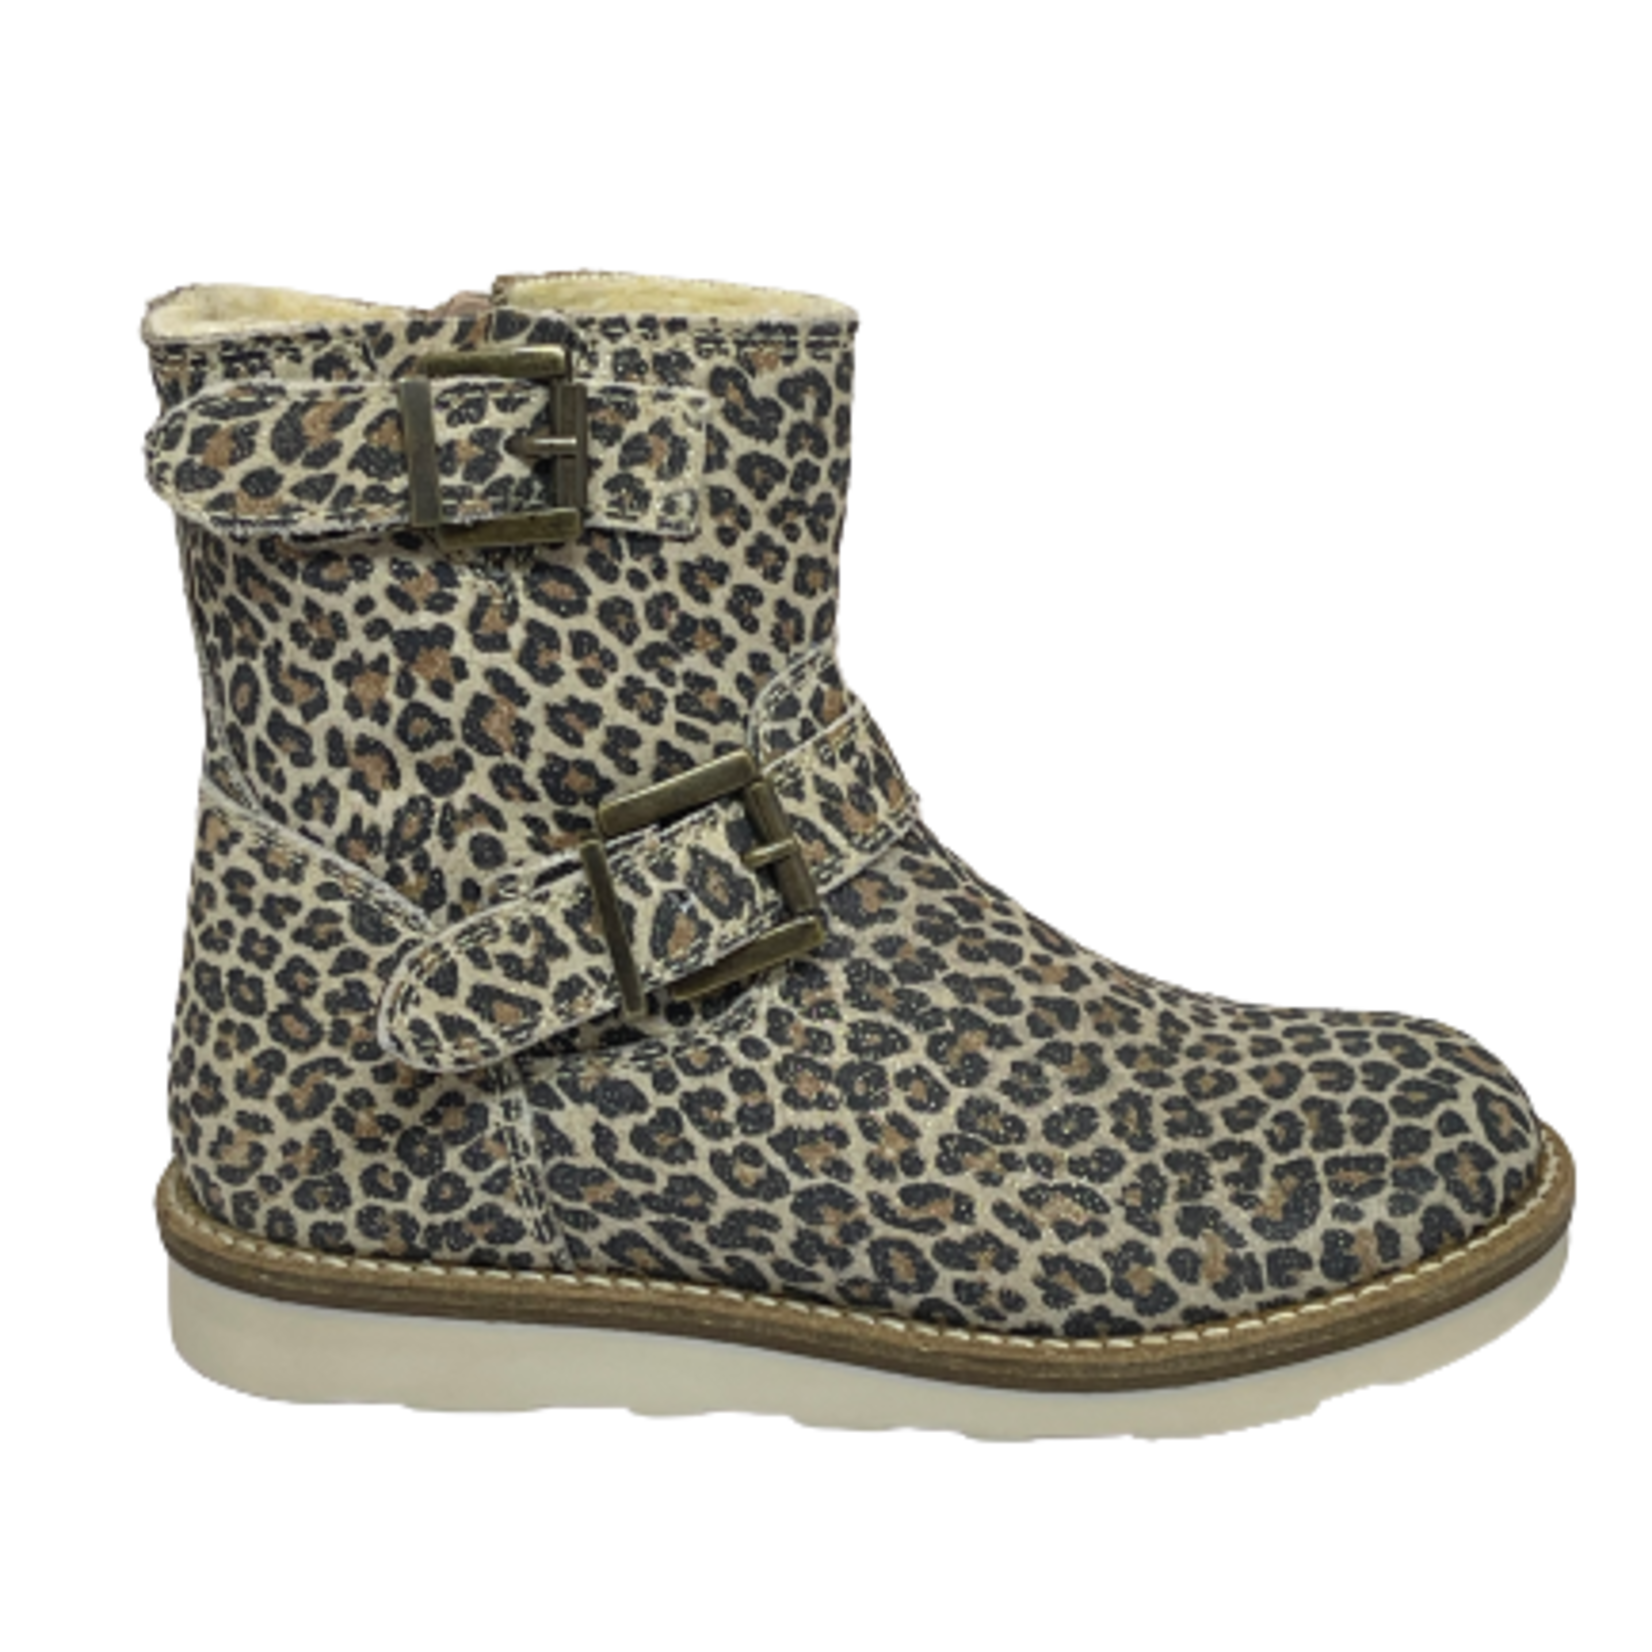 Laars Pels Leopard